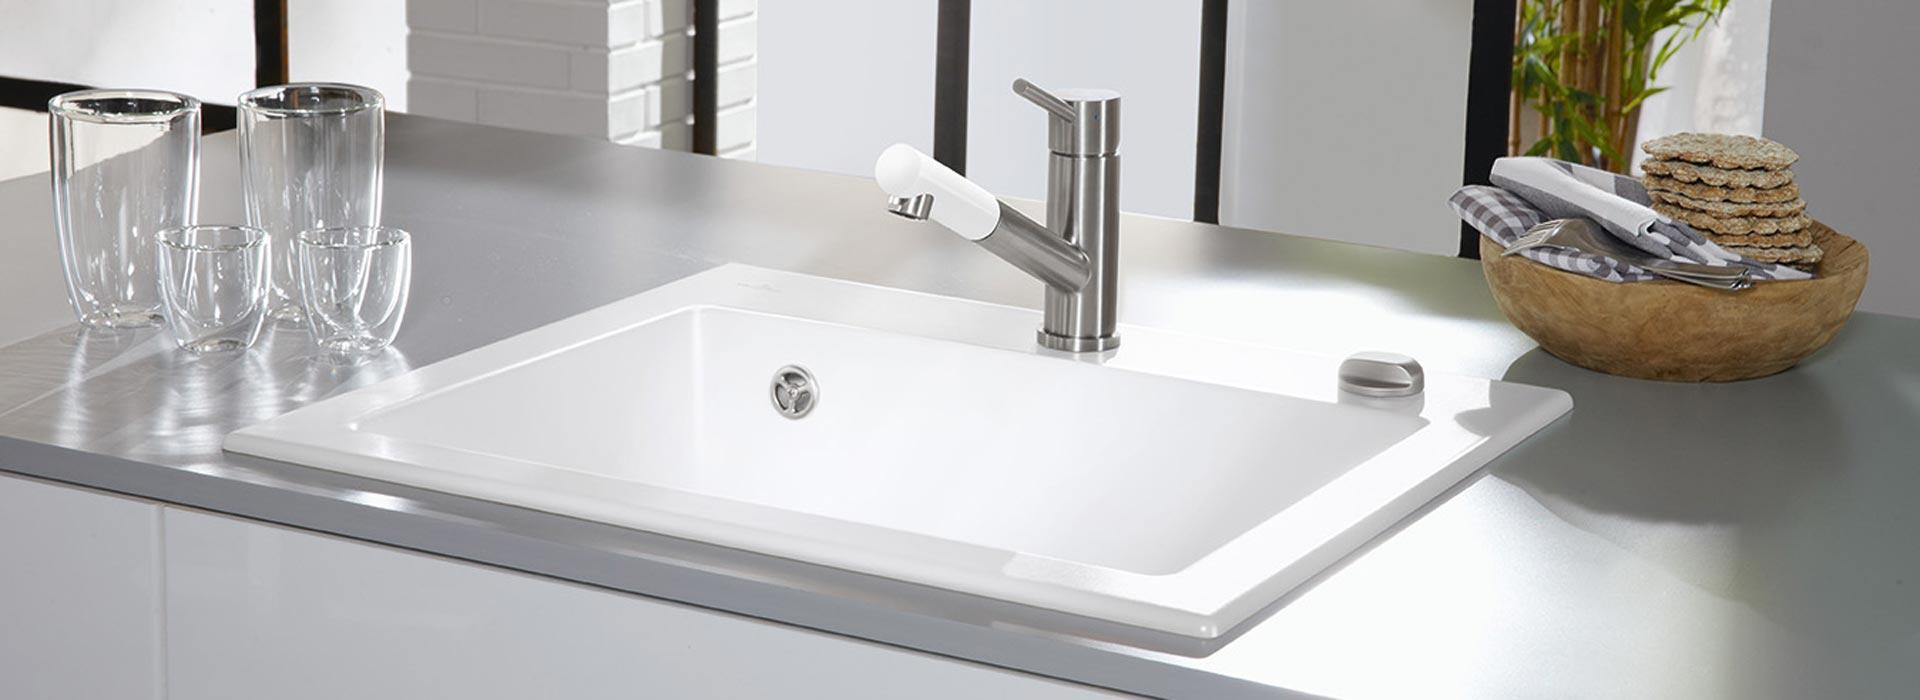 Keuken Planken Gamma : Villeroy & Boch Bathroom Sink